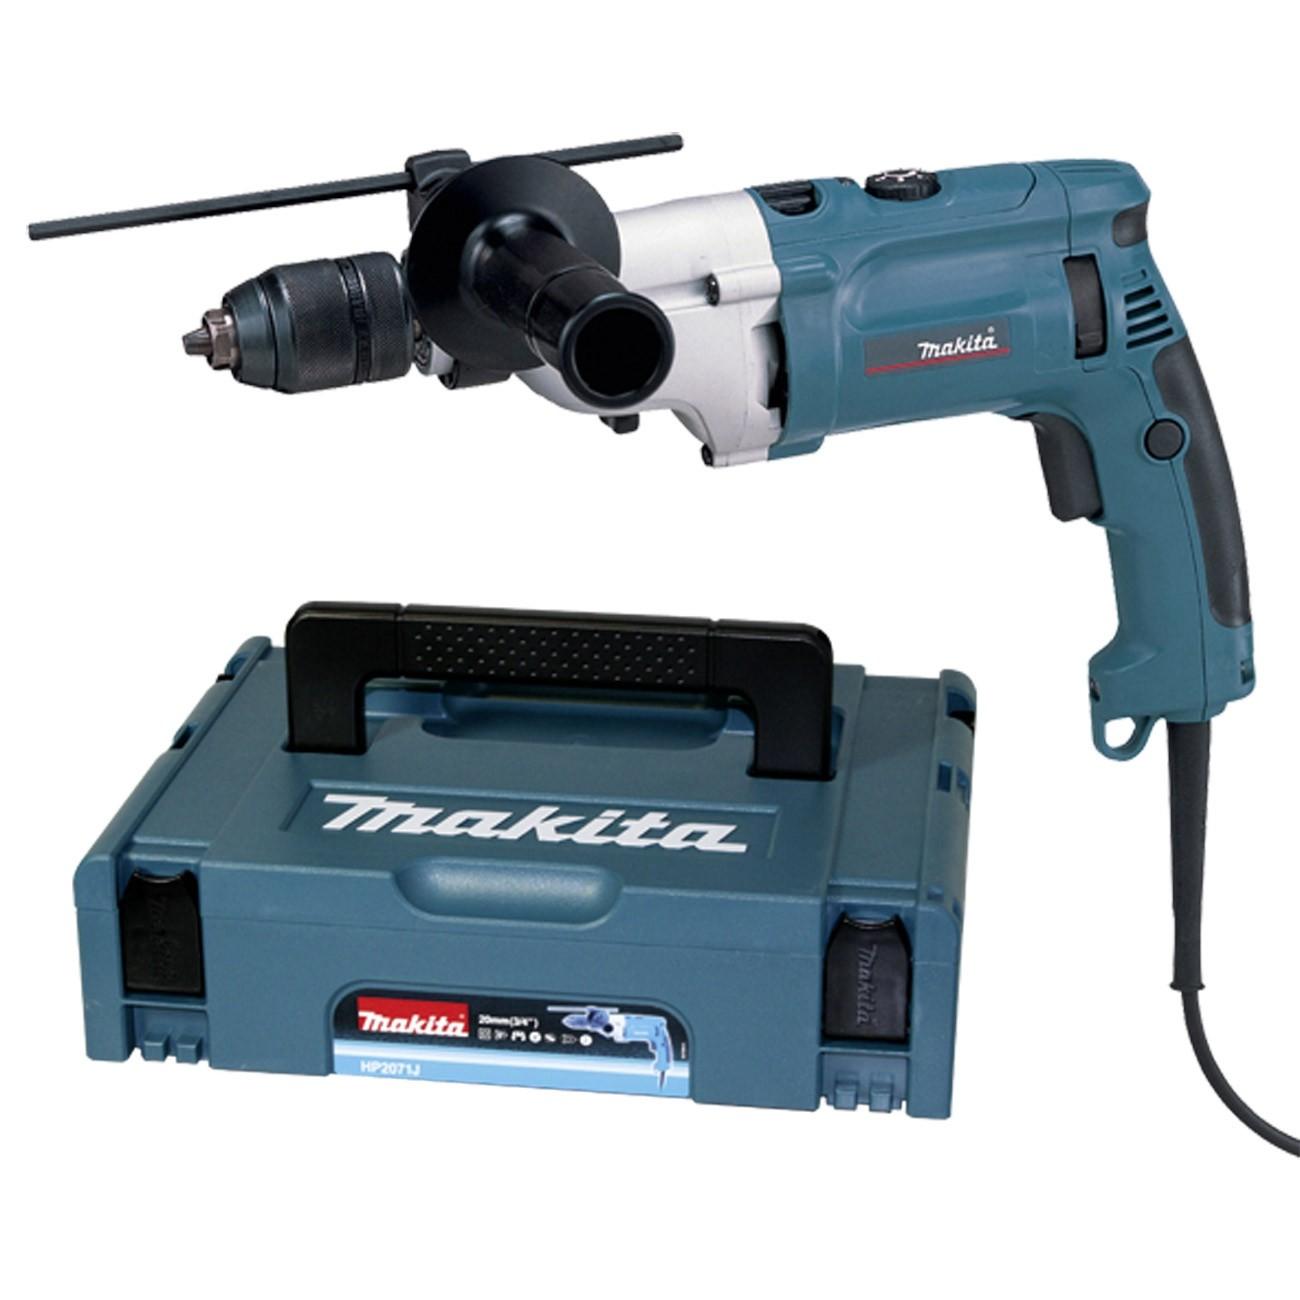 Makita Schlagbohrmaschine Schlagbohrer HP2071J 1010 Watt Bohrmaschine Bohrer 16003